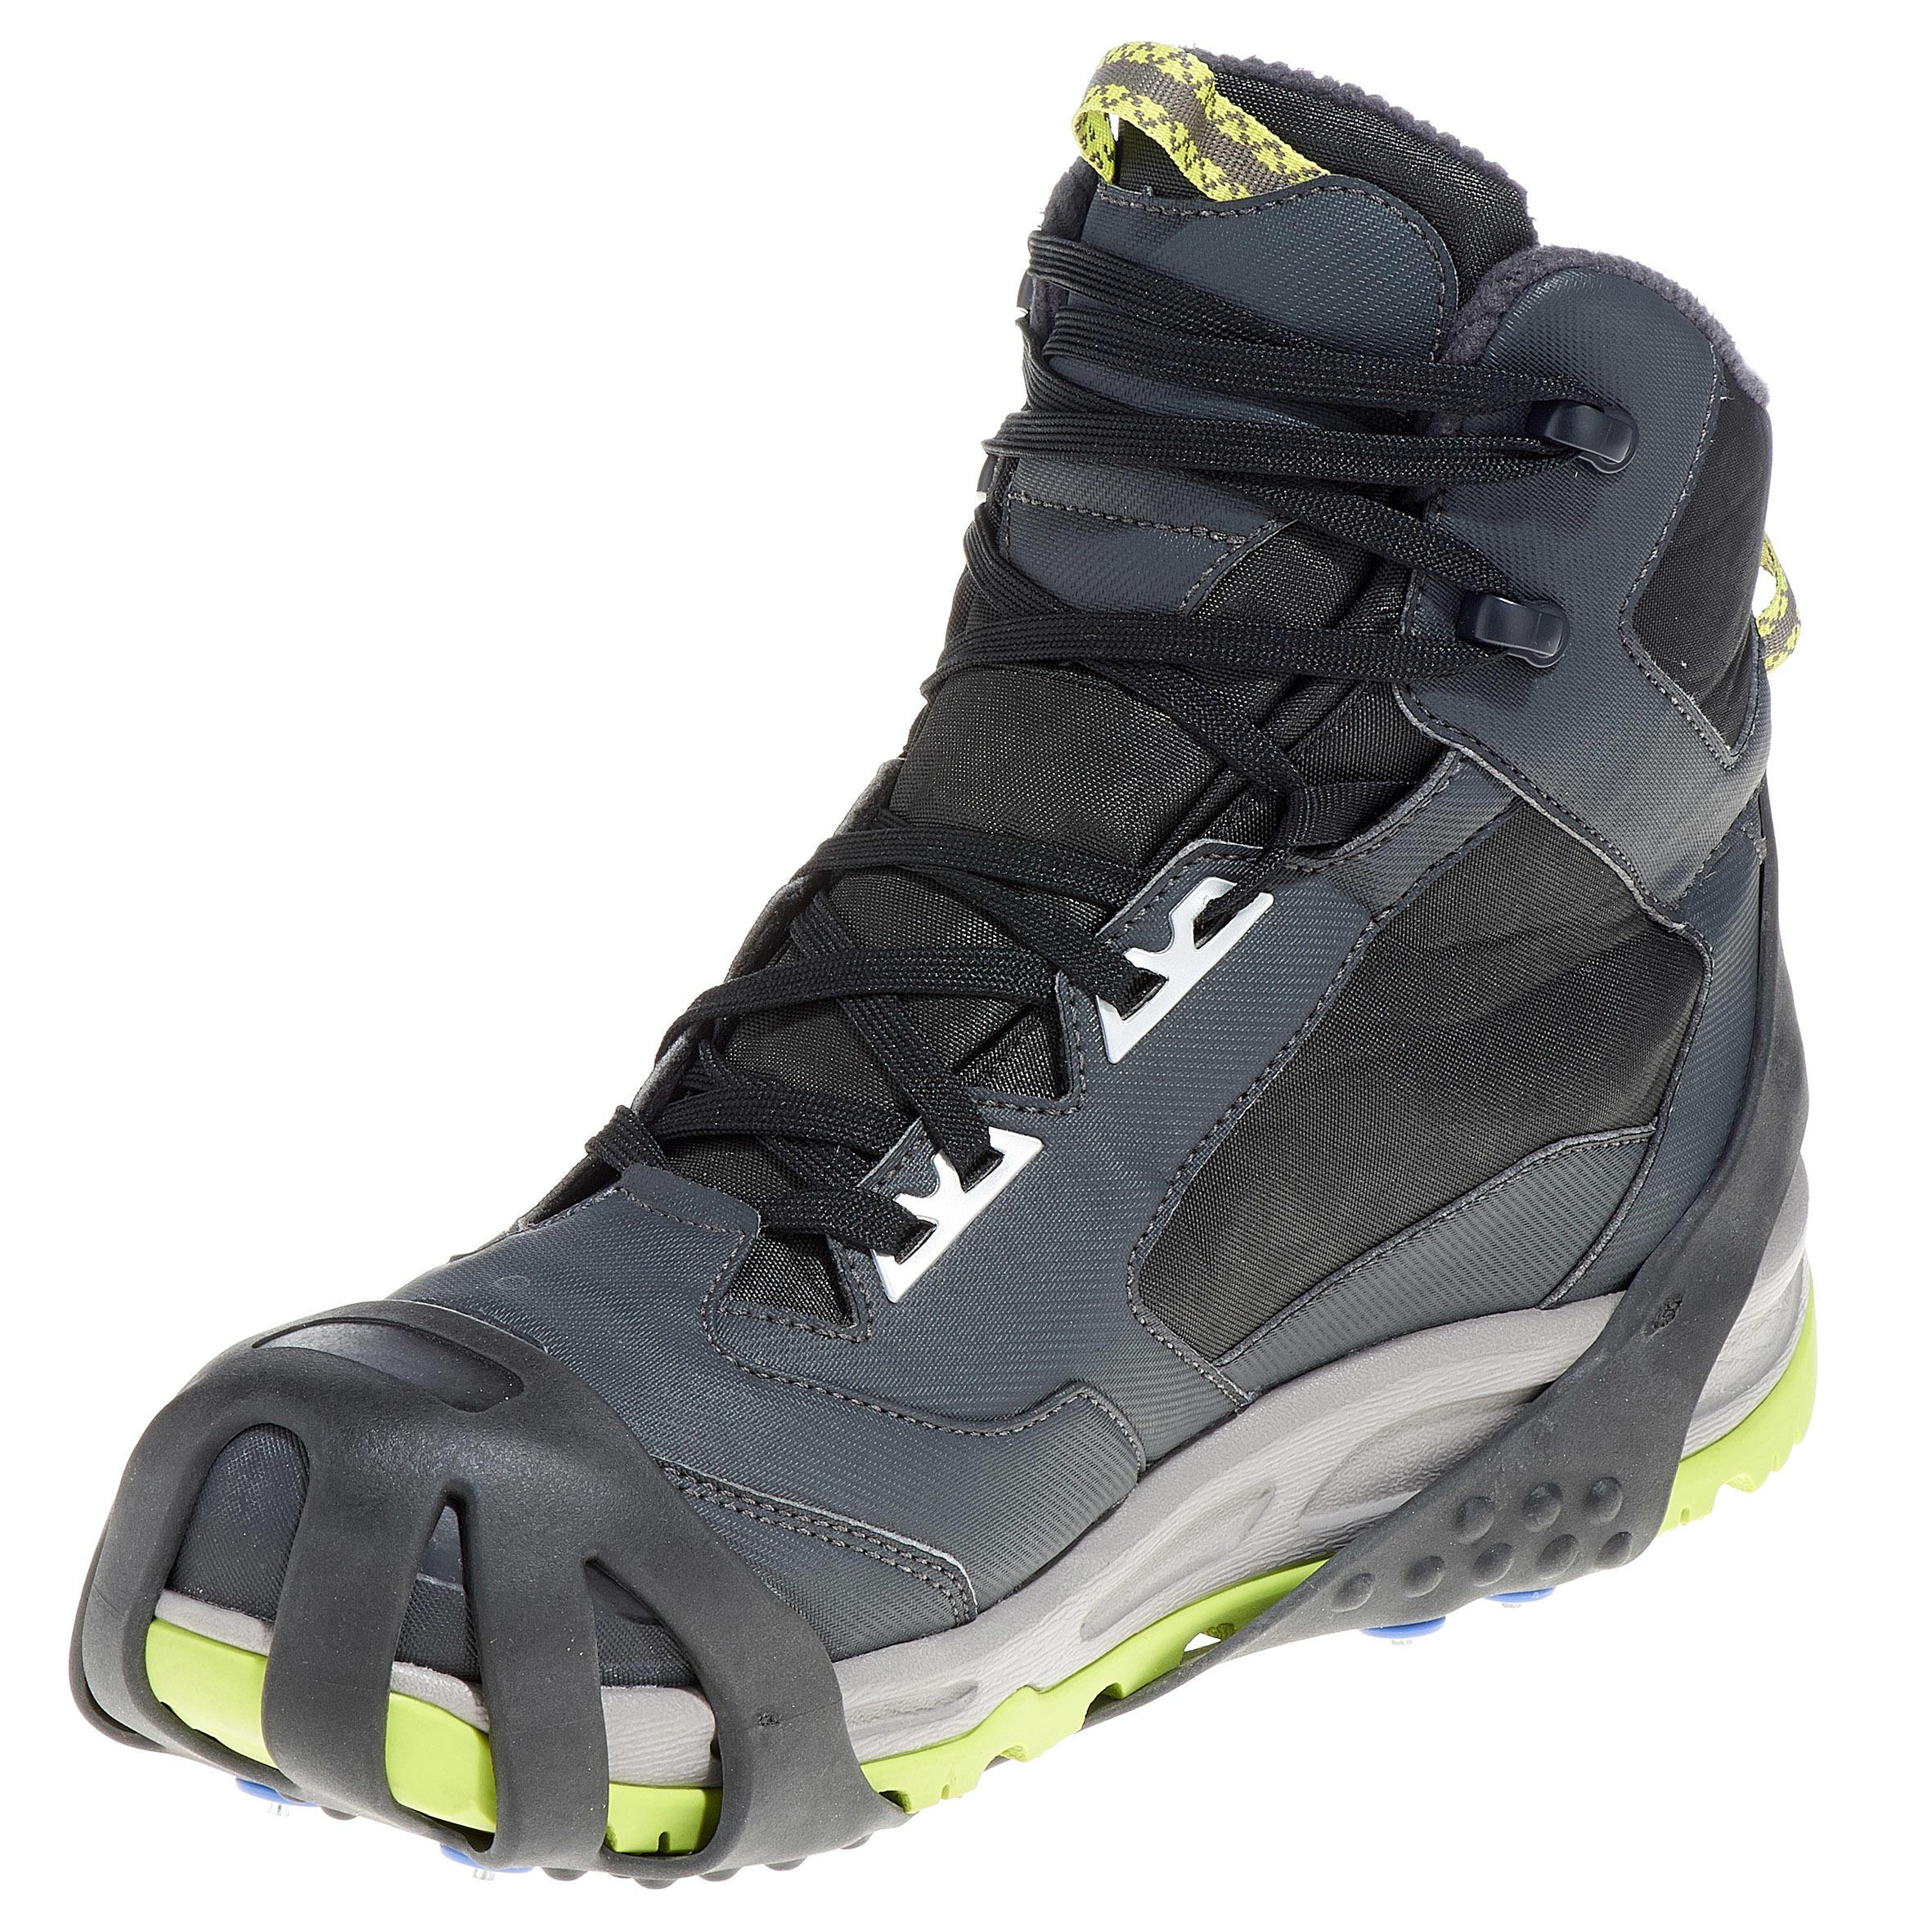 SH100 Snow Hiking Anti-Slip Grip Black